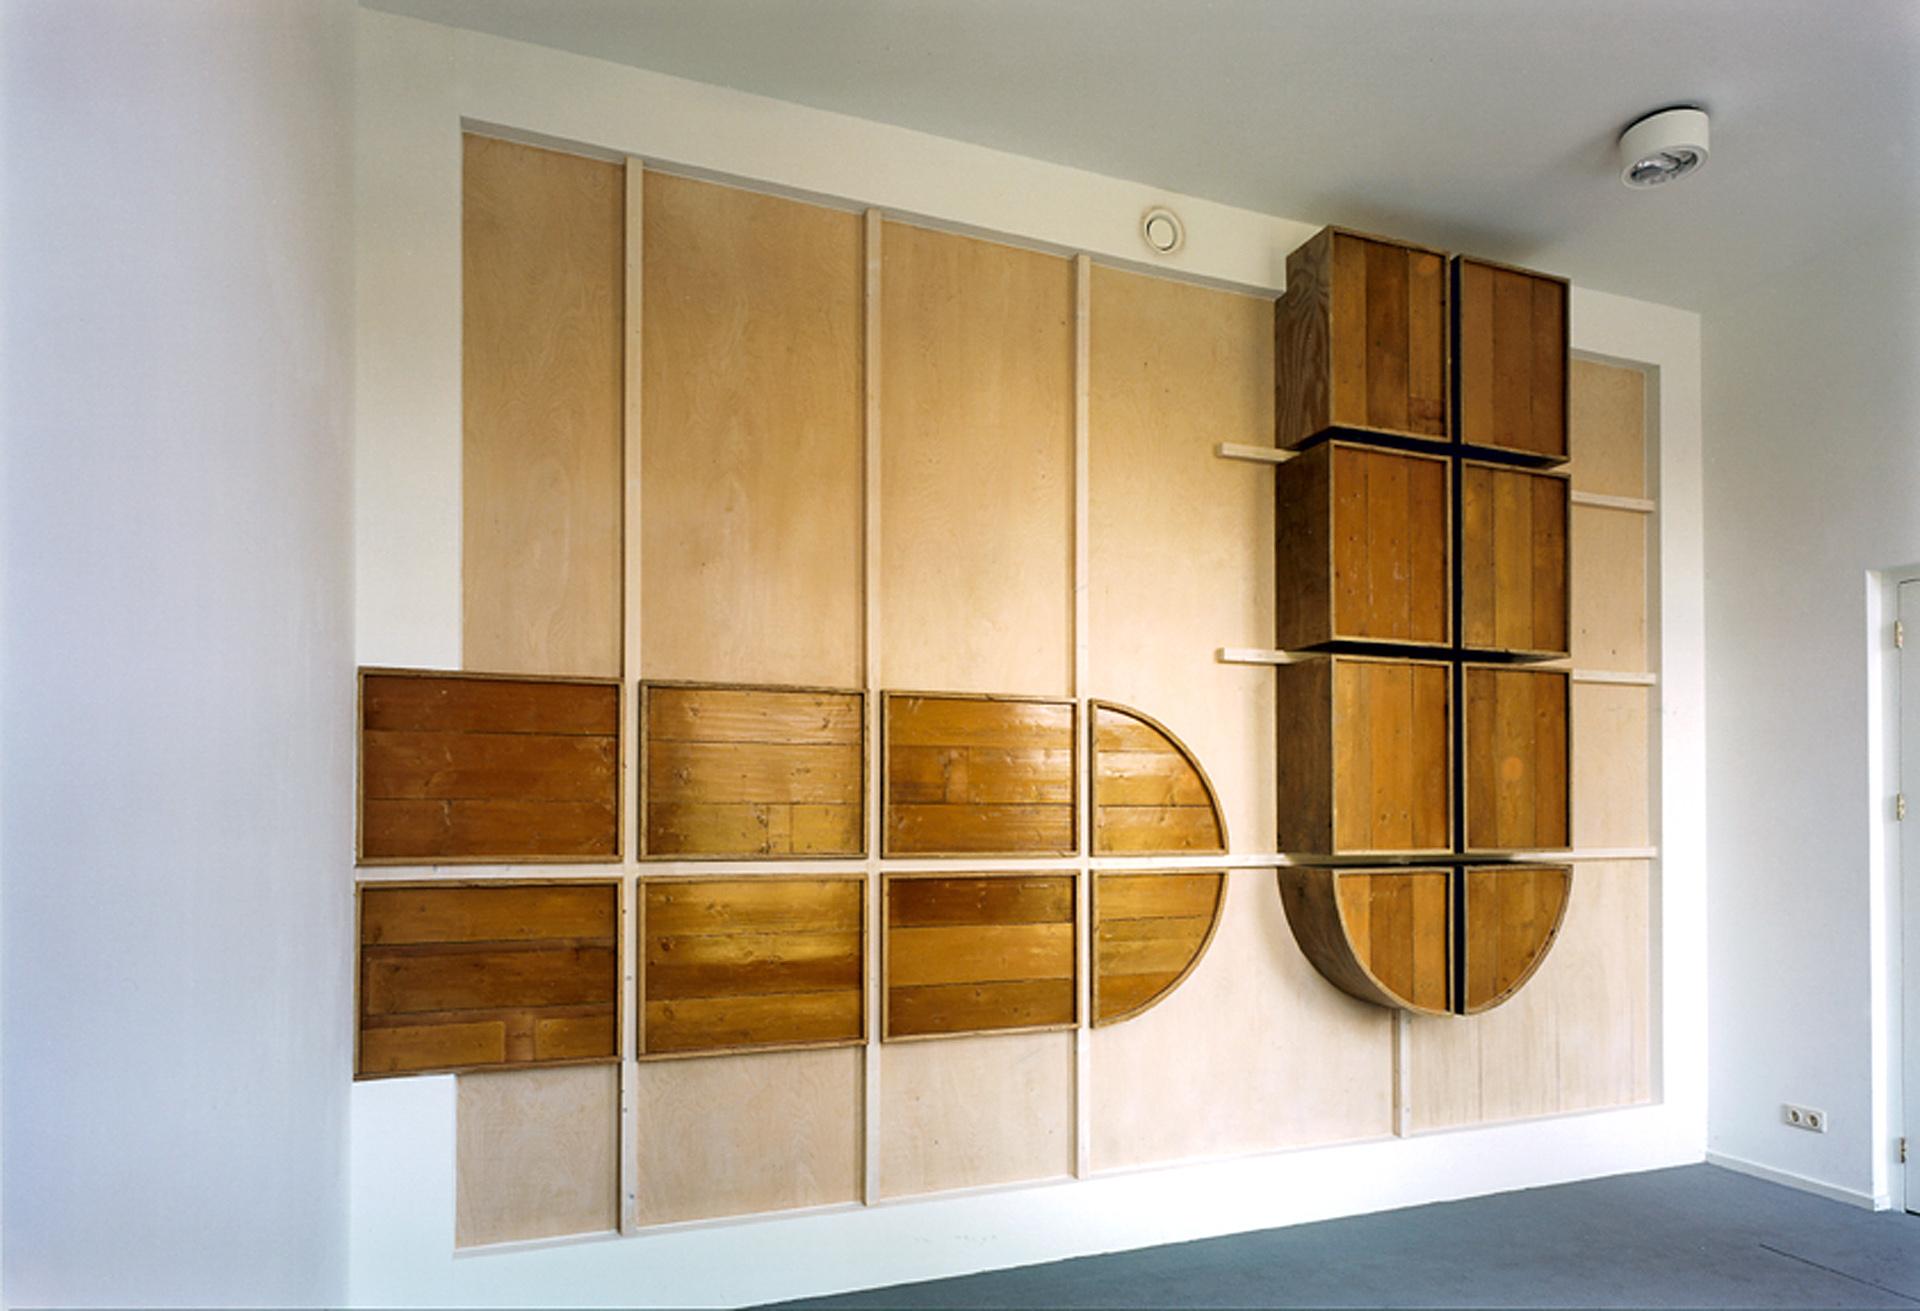 Reception Wall / Post Room